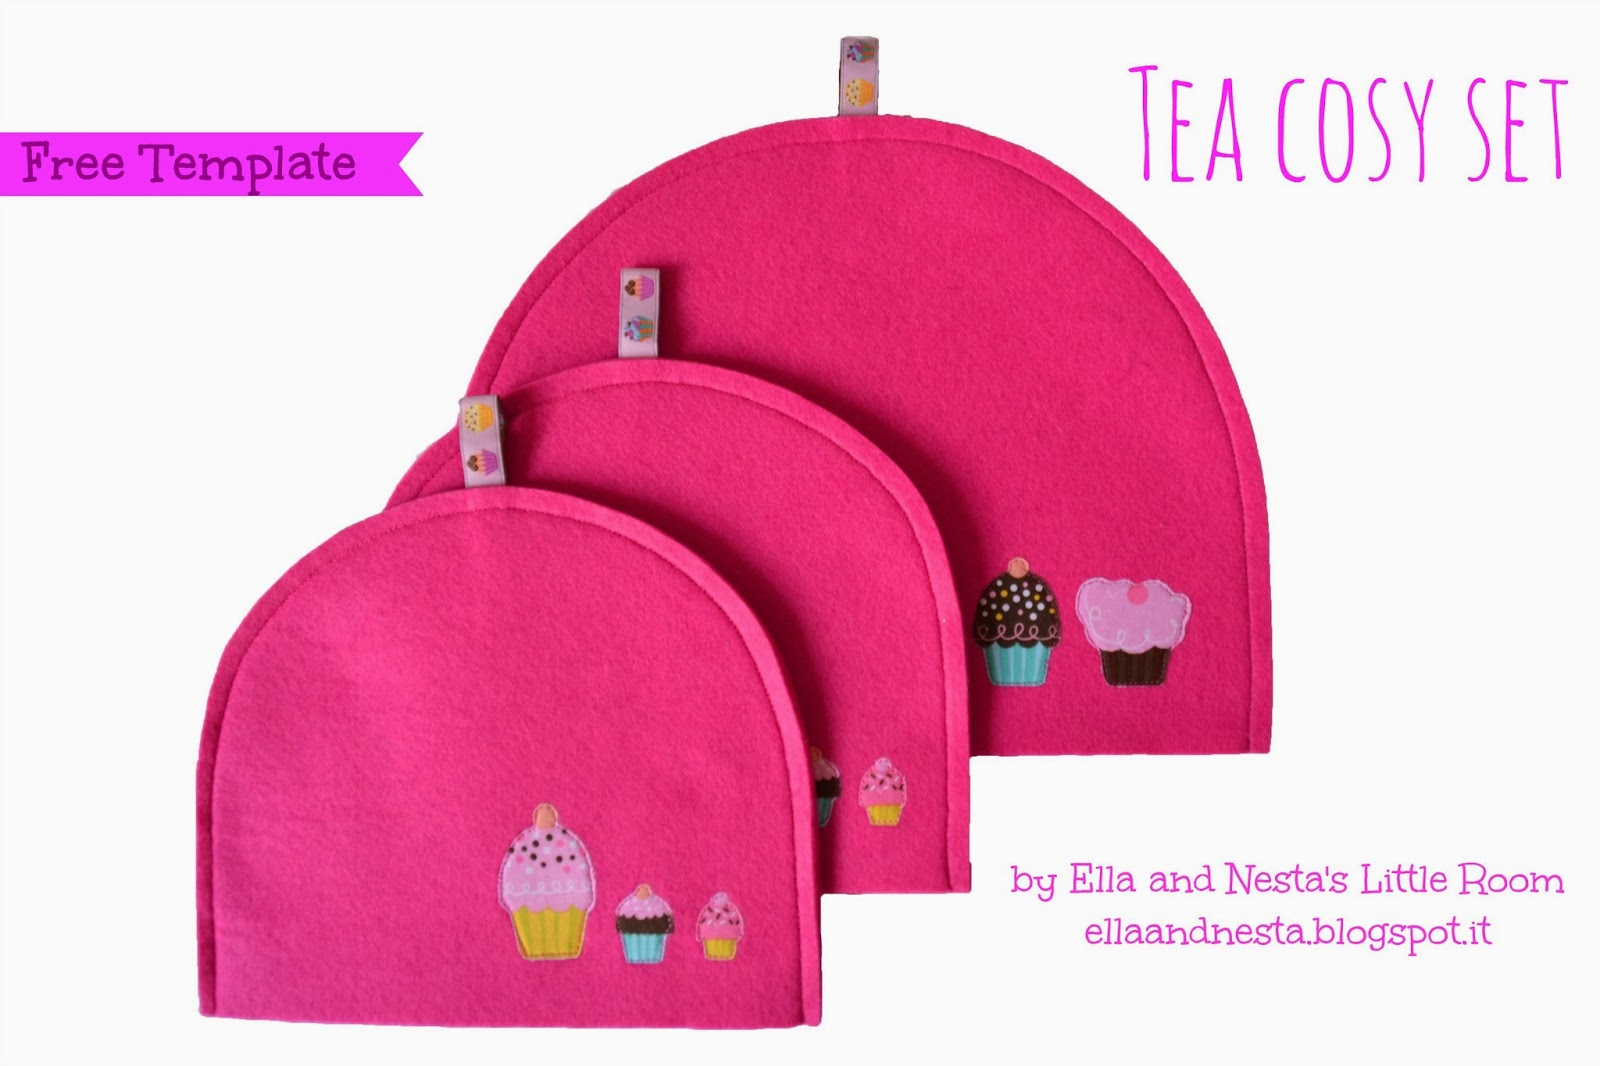 Tea cozy set image_pdf tea cozy pattern template free